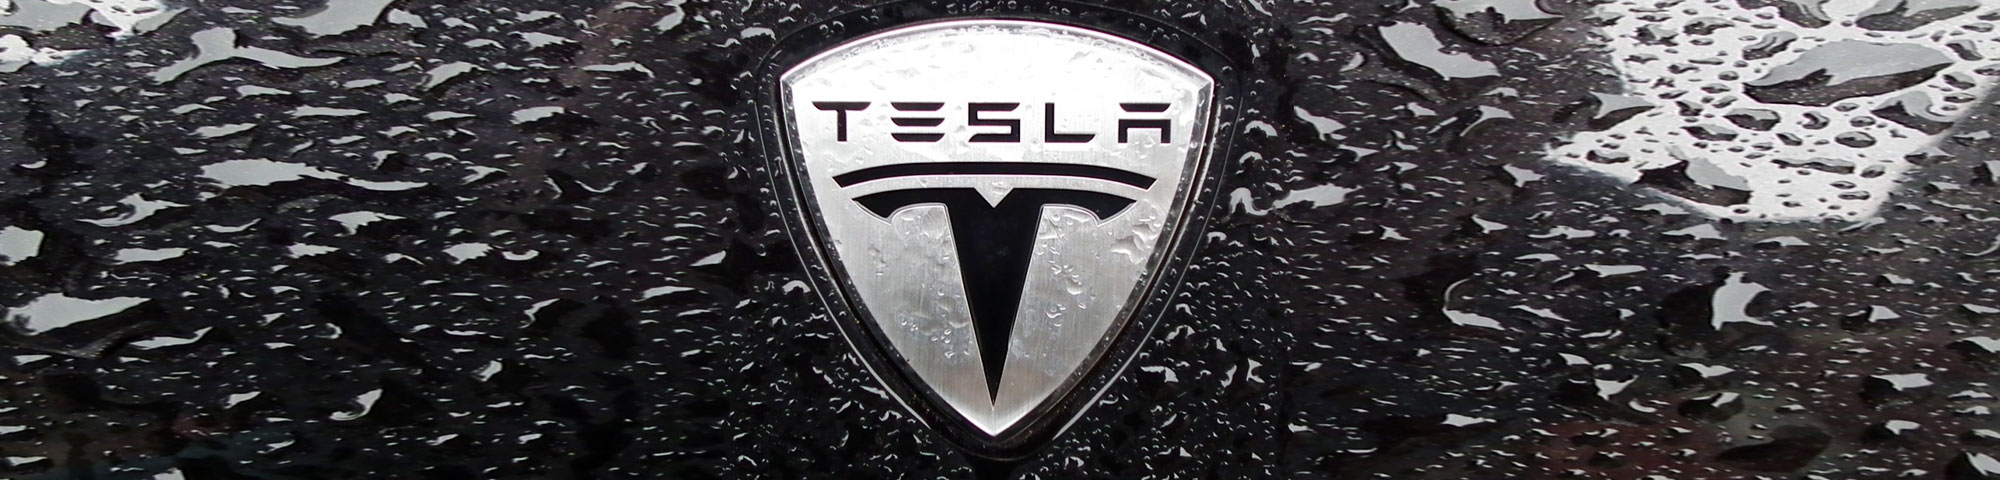 CLMS - Manufacturer - Tesla